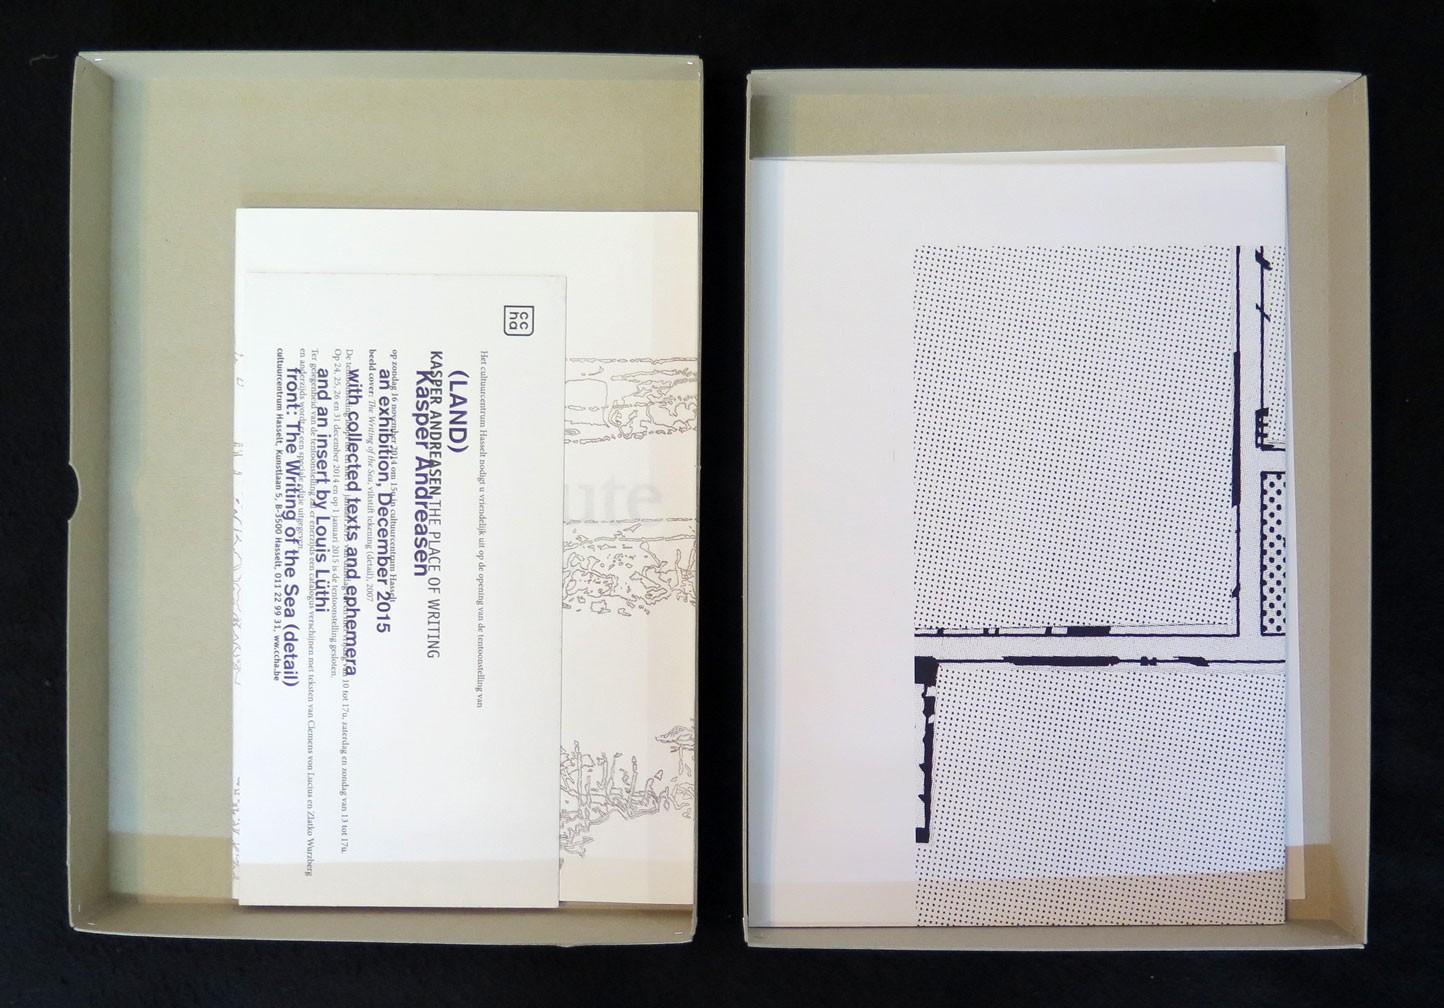 kasper-andreasen_-coop-fanzine_-motto-books_-land-route_-_land_-exhibition-flyer_-_land_-exhibition-guide_--jean-max-colard_-antoine-dufeu_1